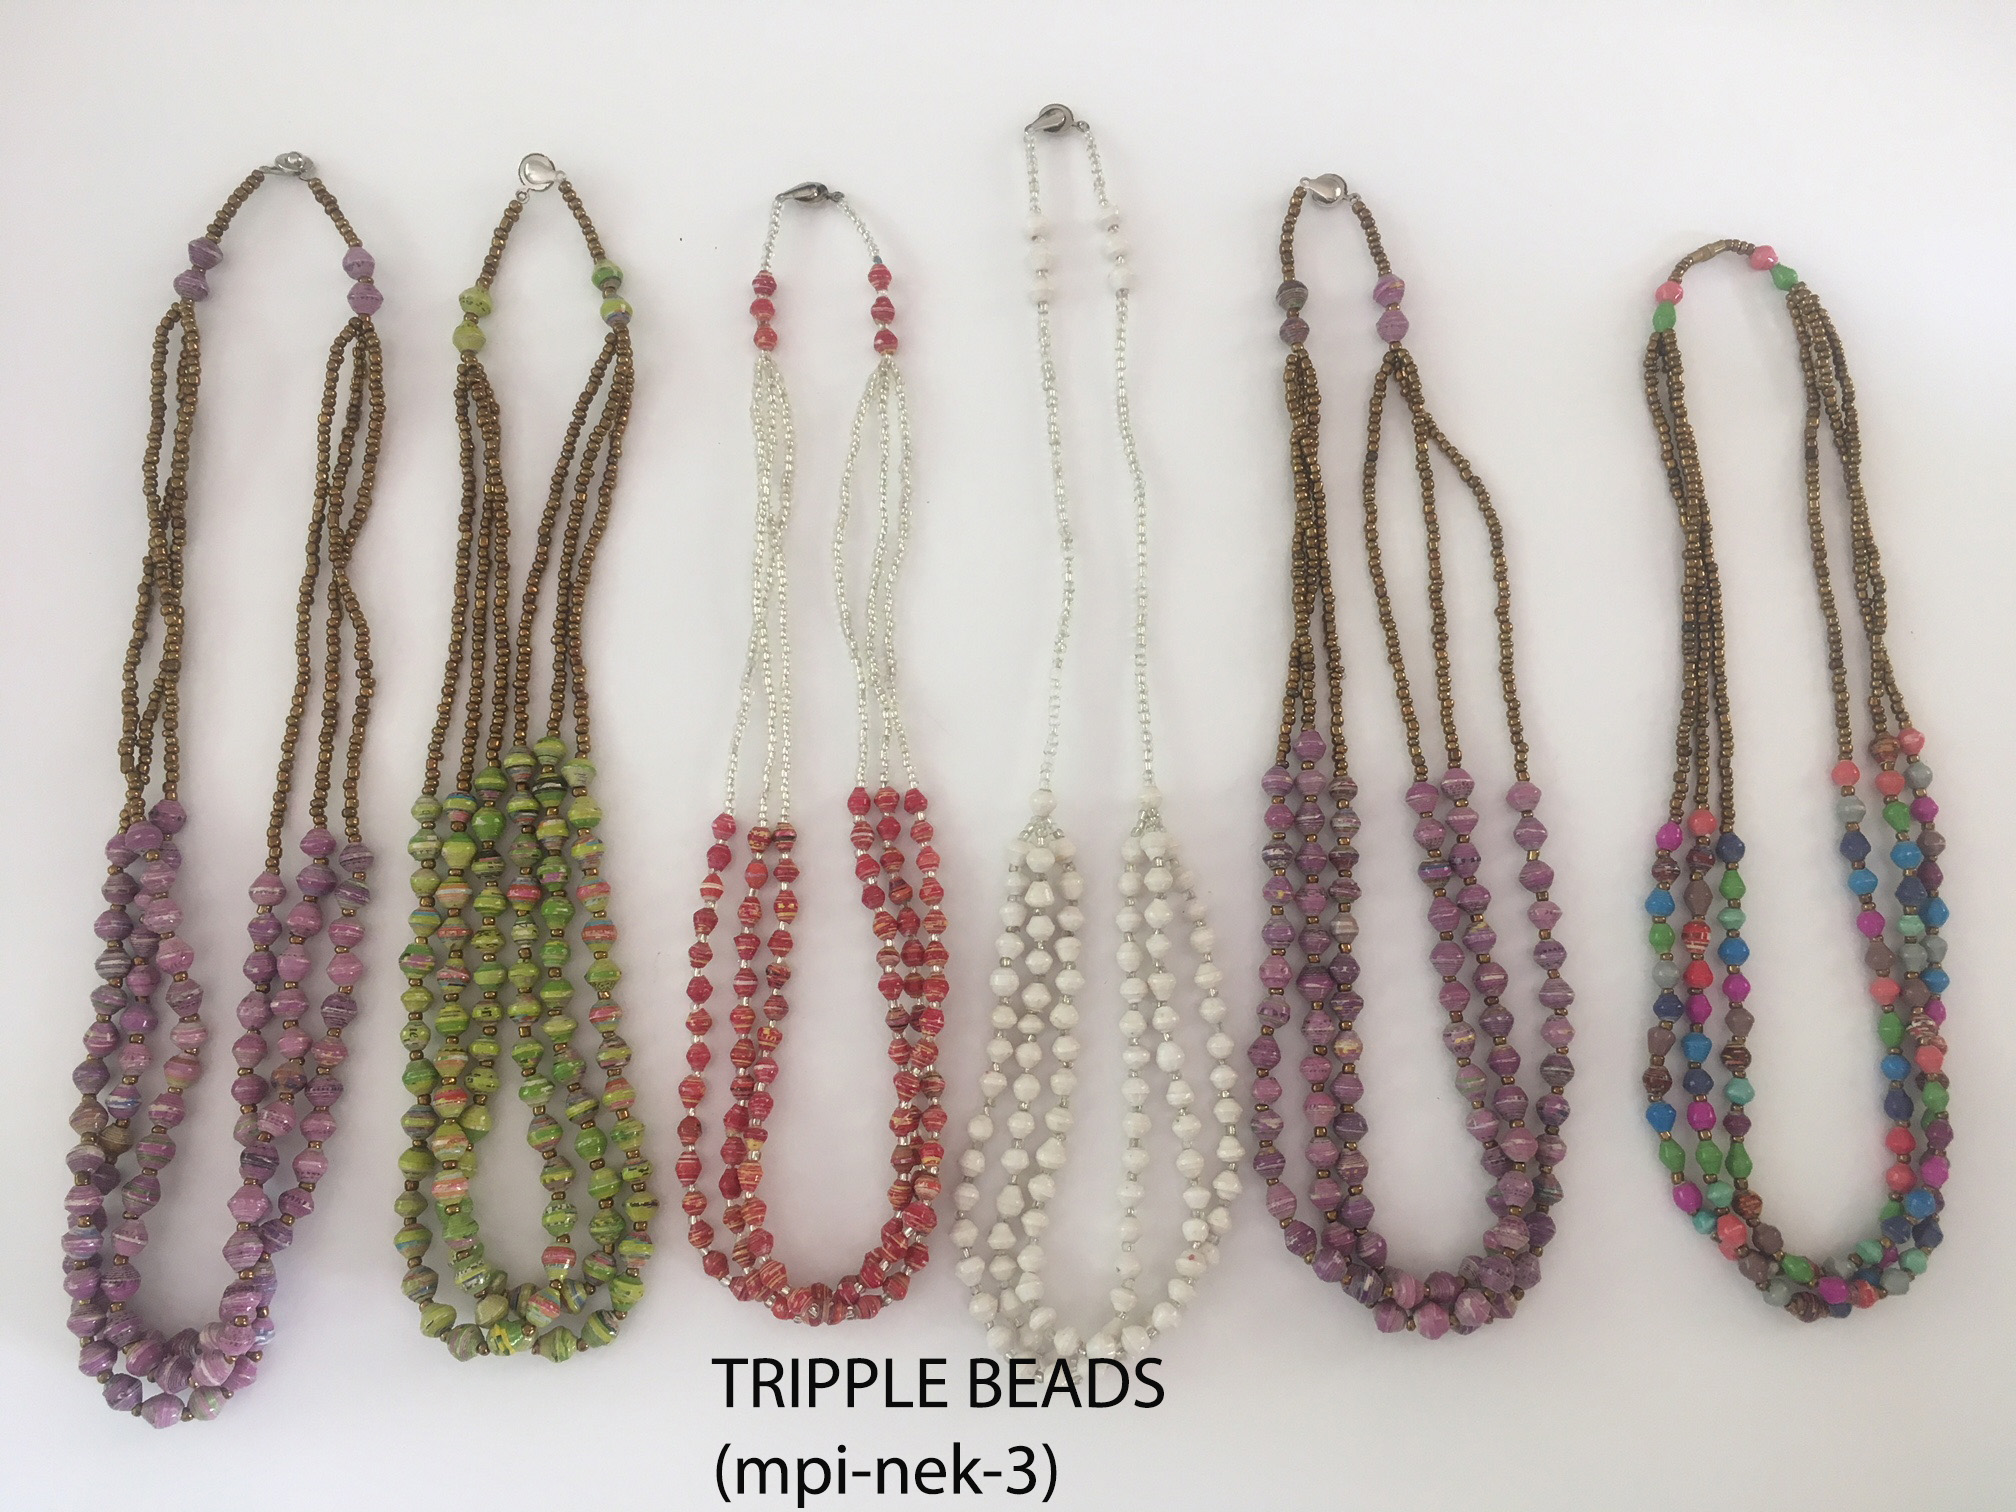 Tripple Beads (mpi-nek-3)